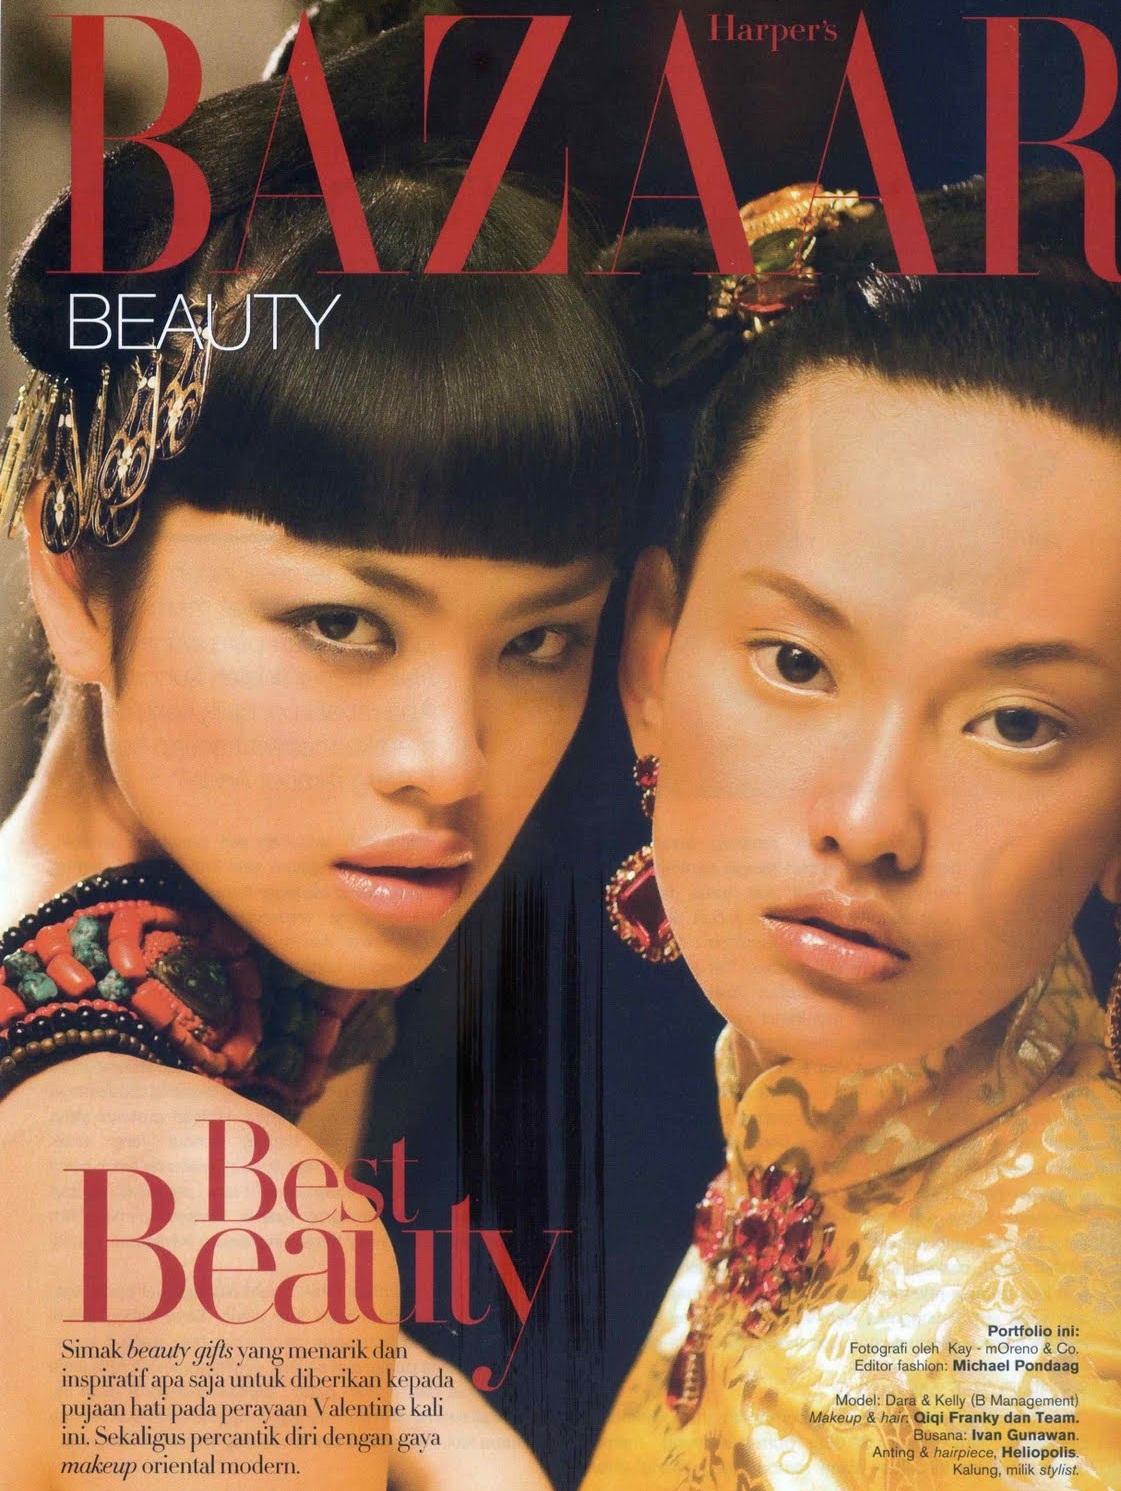 http://1.bp.blogspot.com/_m_3PqTnwV8k/TLdvctw1WuI/AAAAAAAARDc/zcFb4n1PujI/s1600/Kelly+Tandiono+%26+Dara+-+Harper%27s+Bazaar+Indonesia+May+2010.jpg